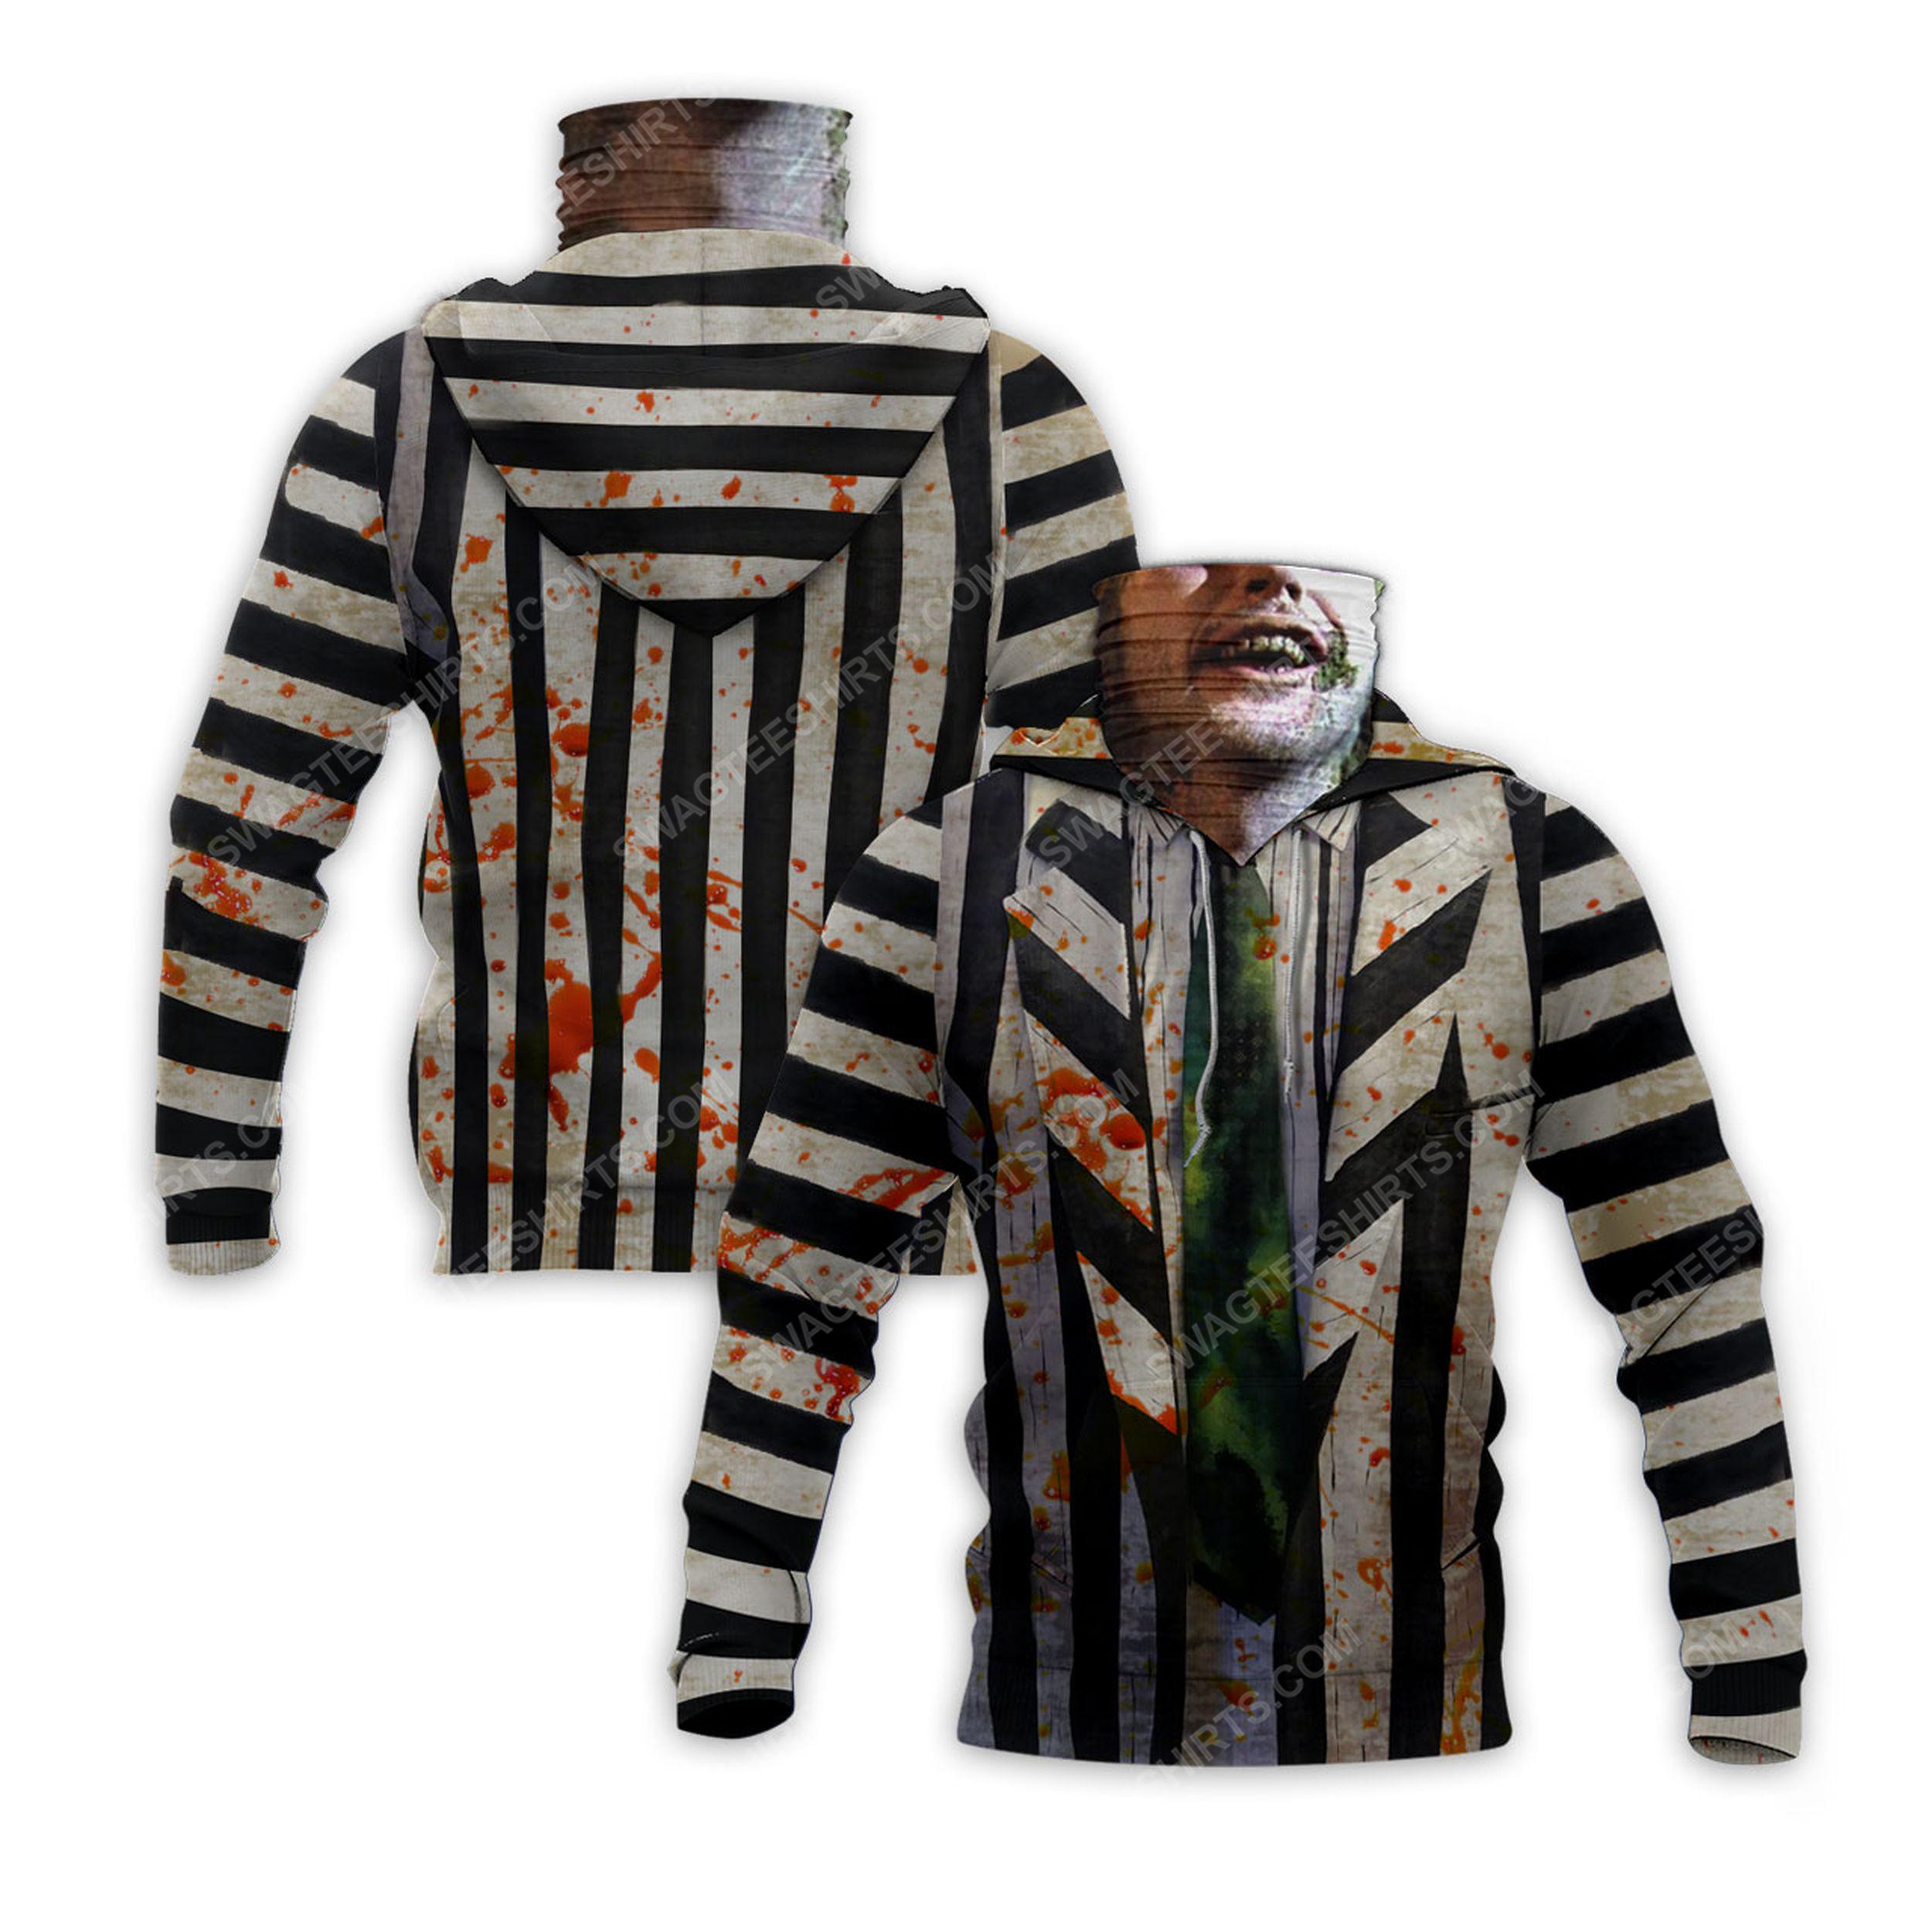 American horror comedy beetlejuice for halloween full print mask hoodie 2(1) - Copy